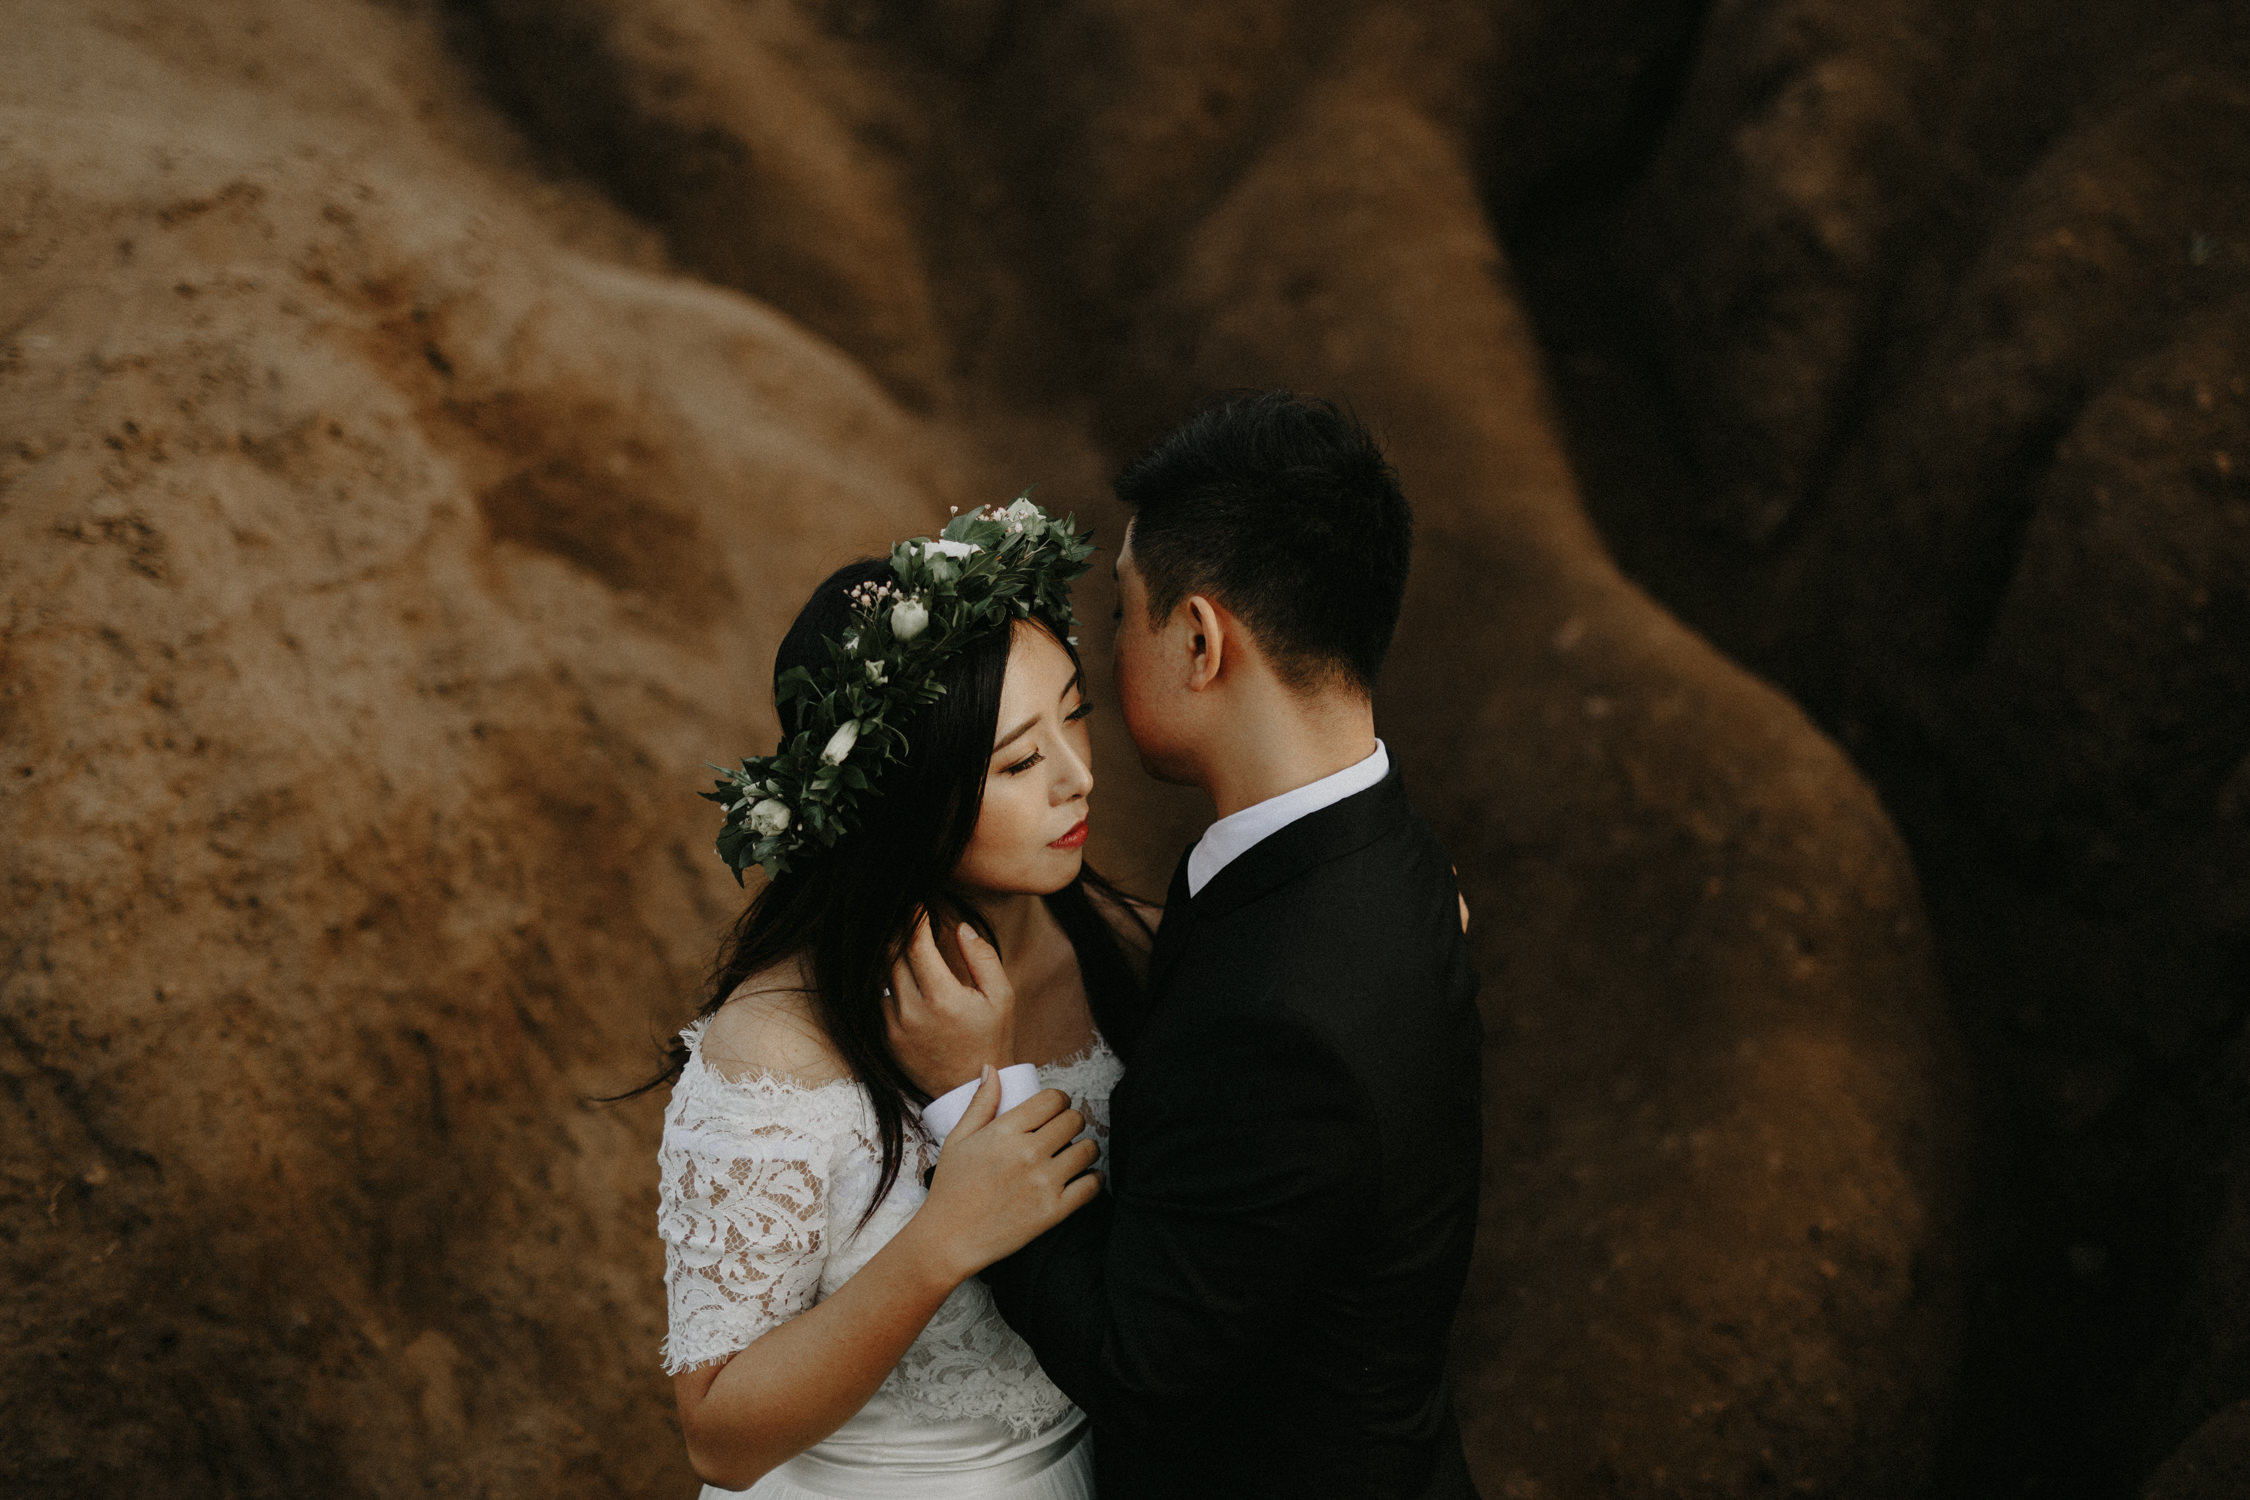 couple-engagement-marin-headlands_0070.jpg